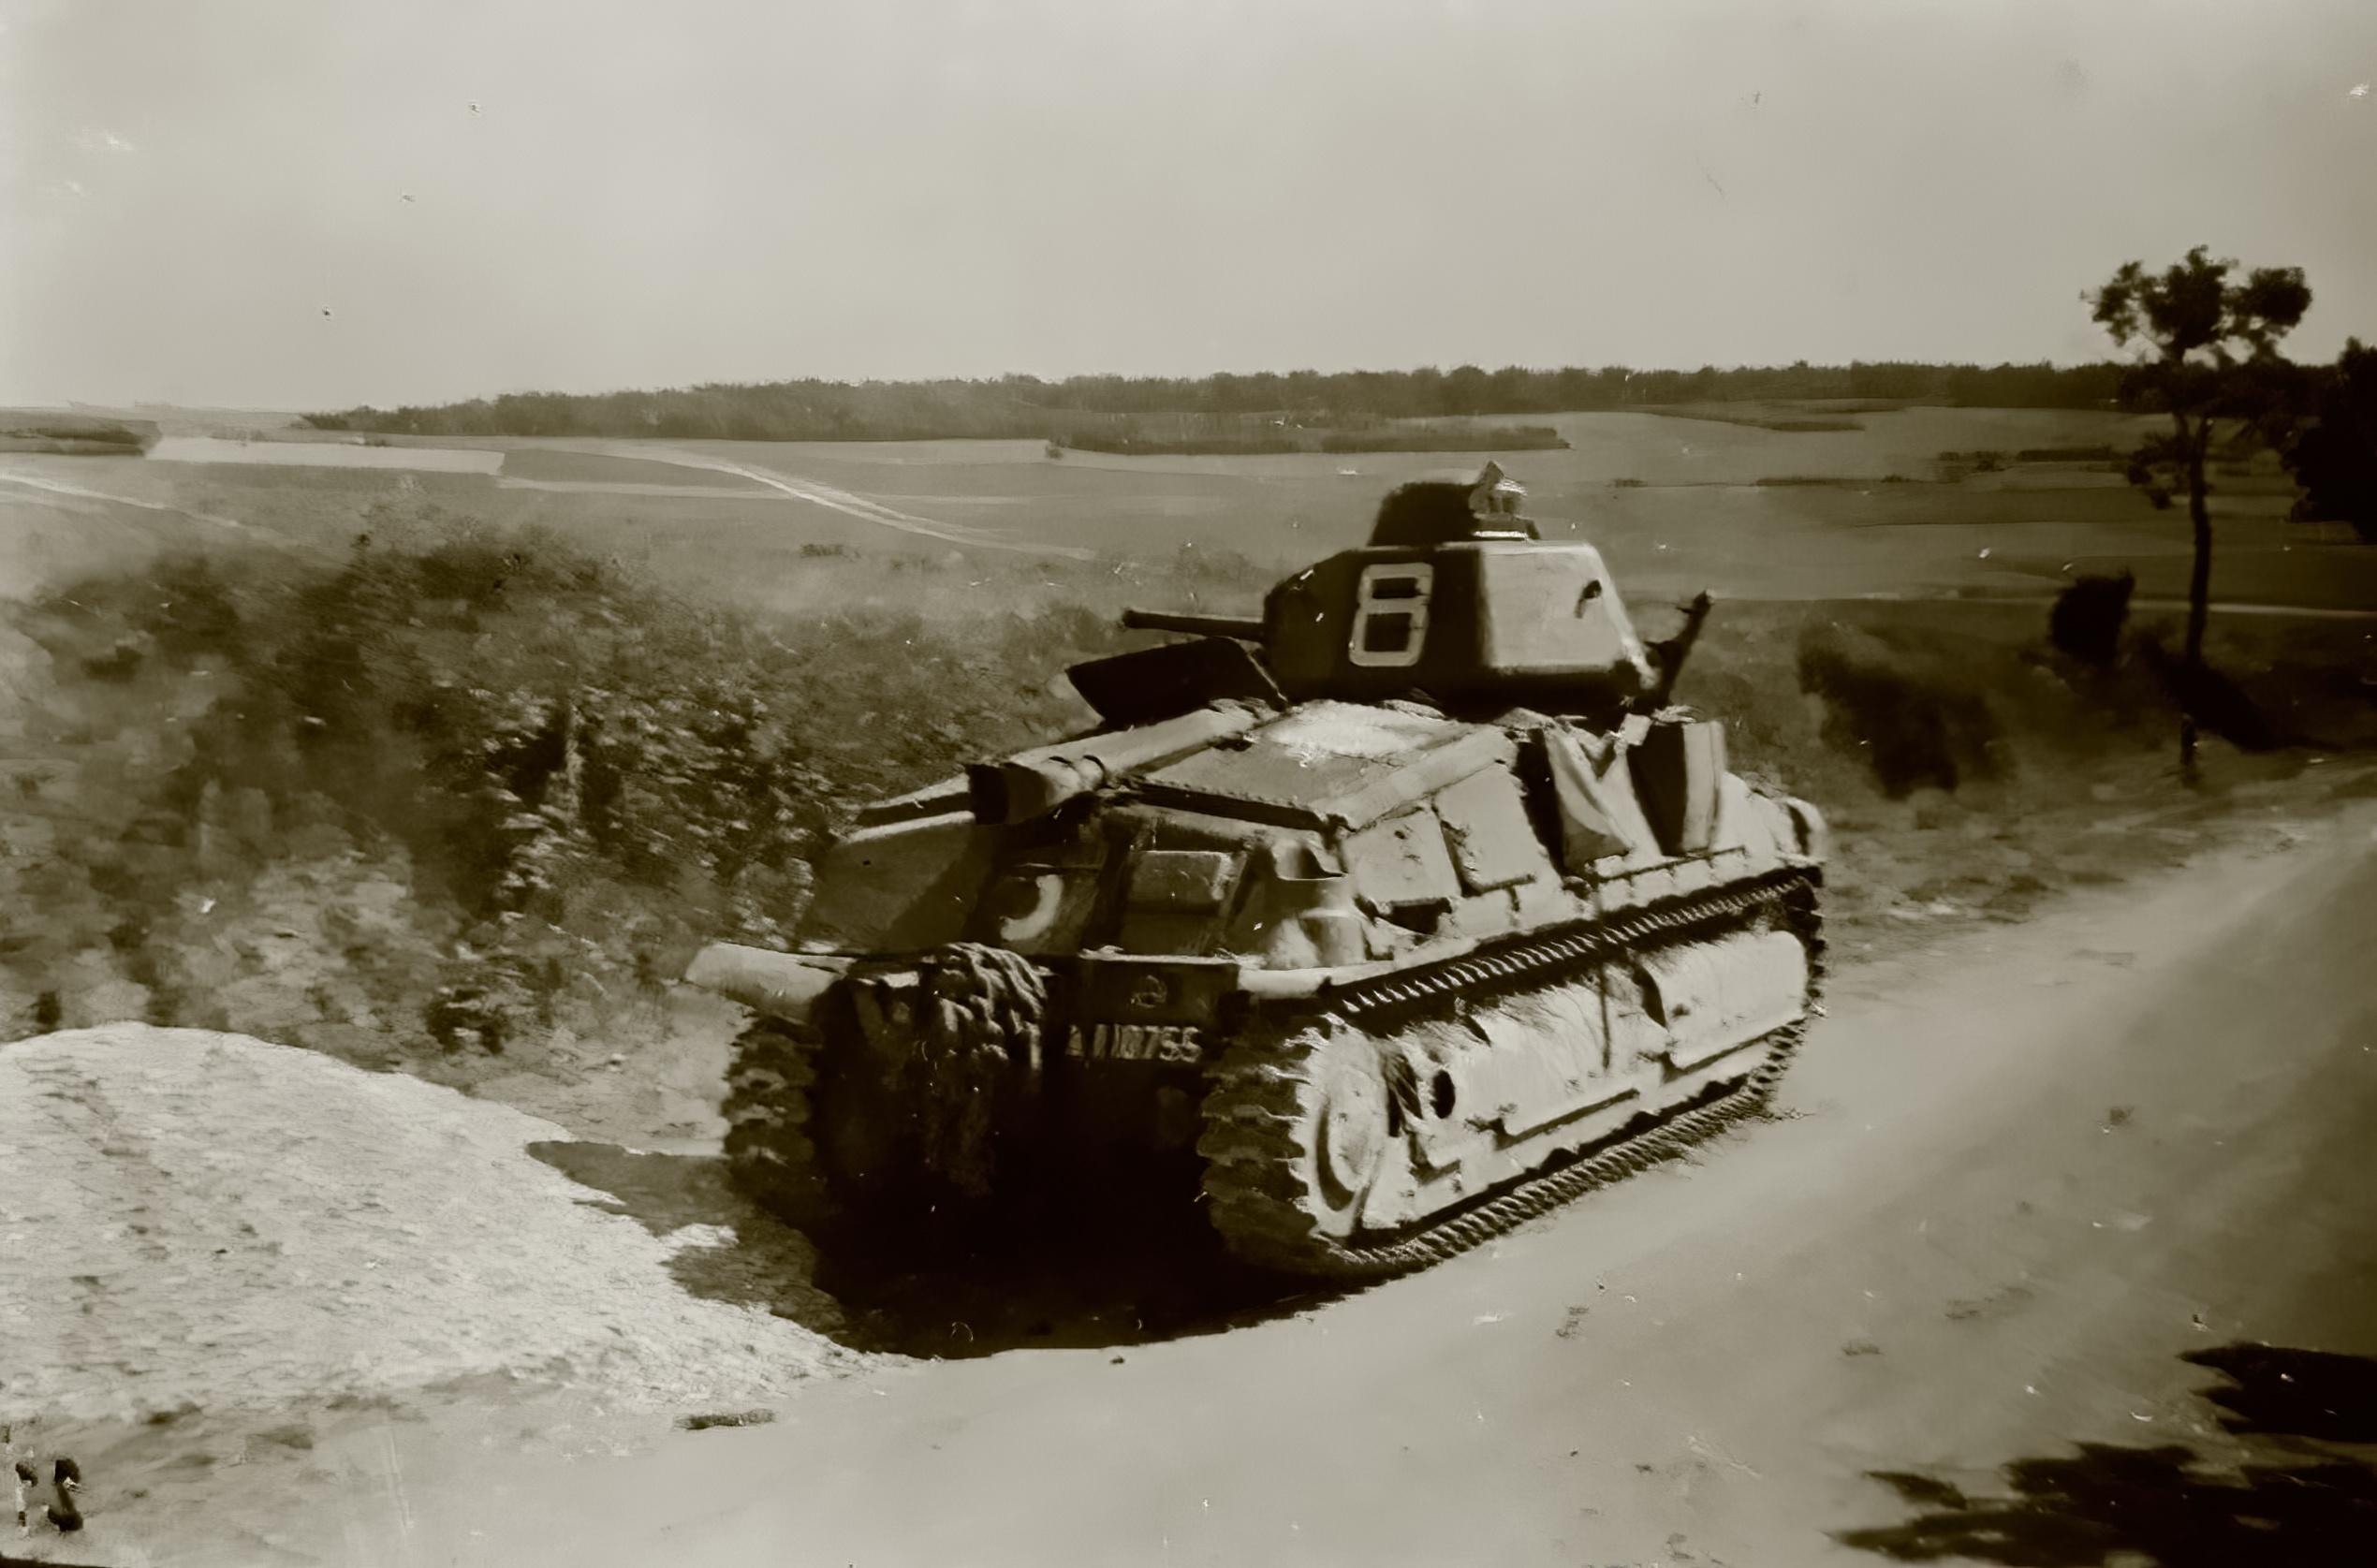 French Army Somua S35 sn 10755 White 8 abandoned along a roadside France June 1940 ebay 01